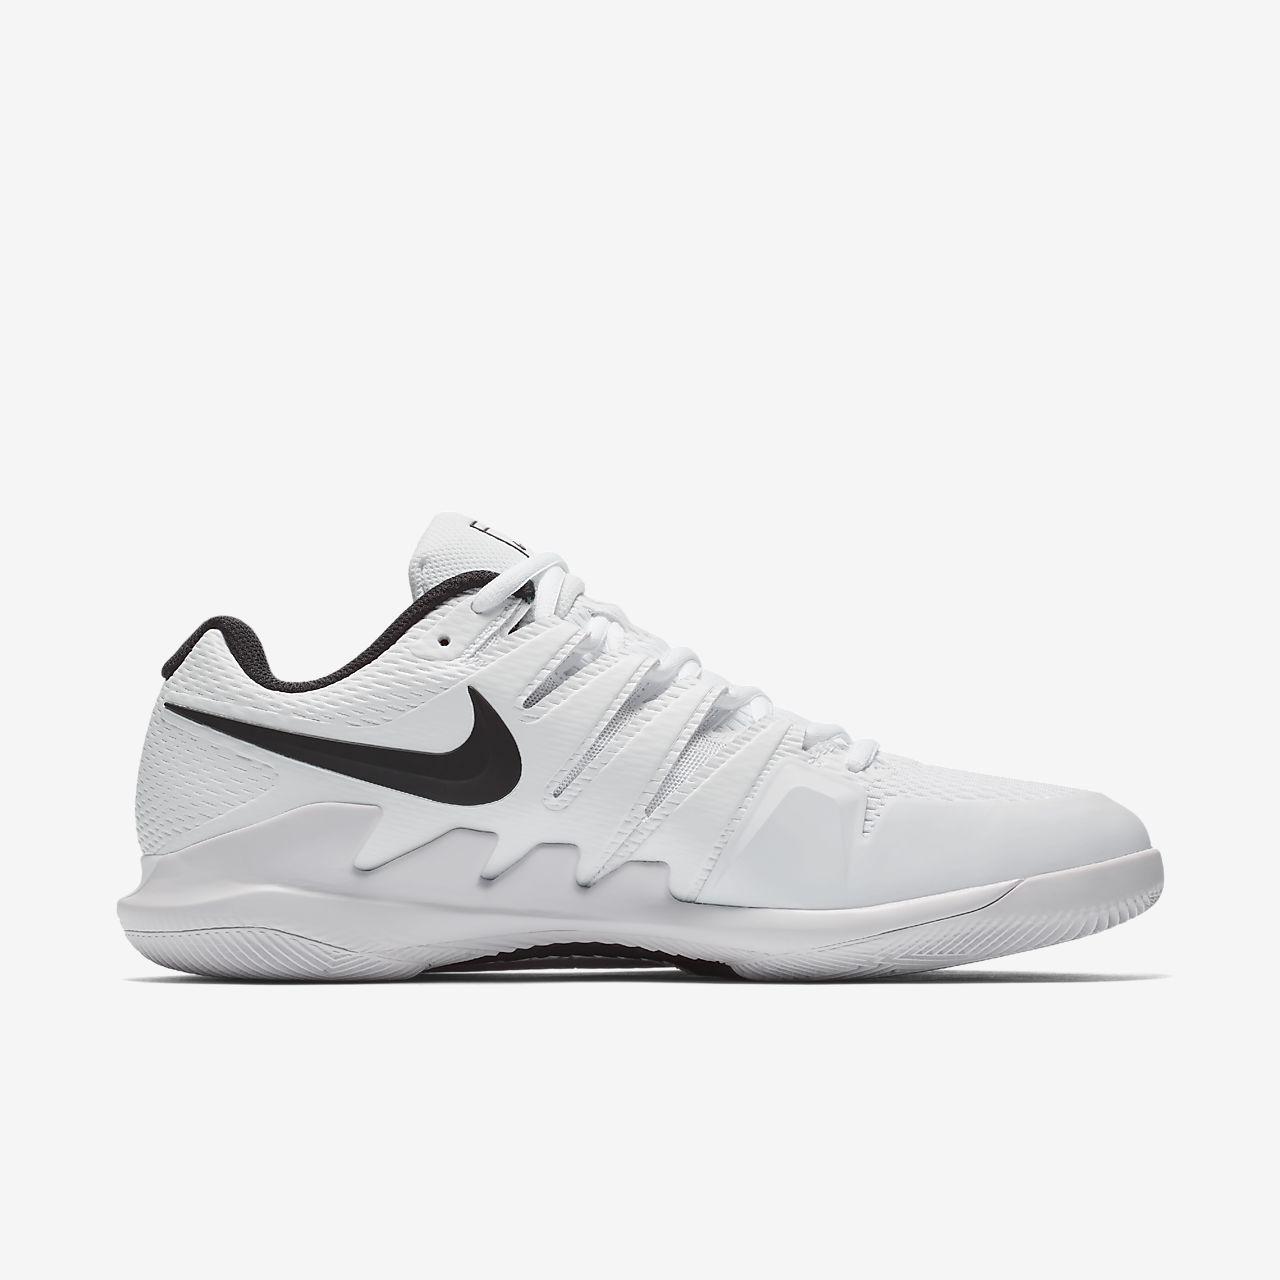 Nike Court Lite, Chaussures de Tennis Homme, Noir (Black/White/Medium Grey 010), 45.5 EU